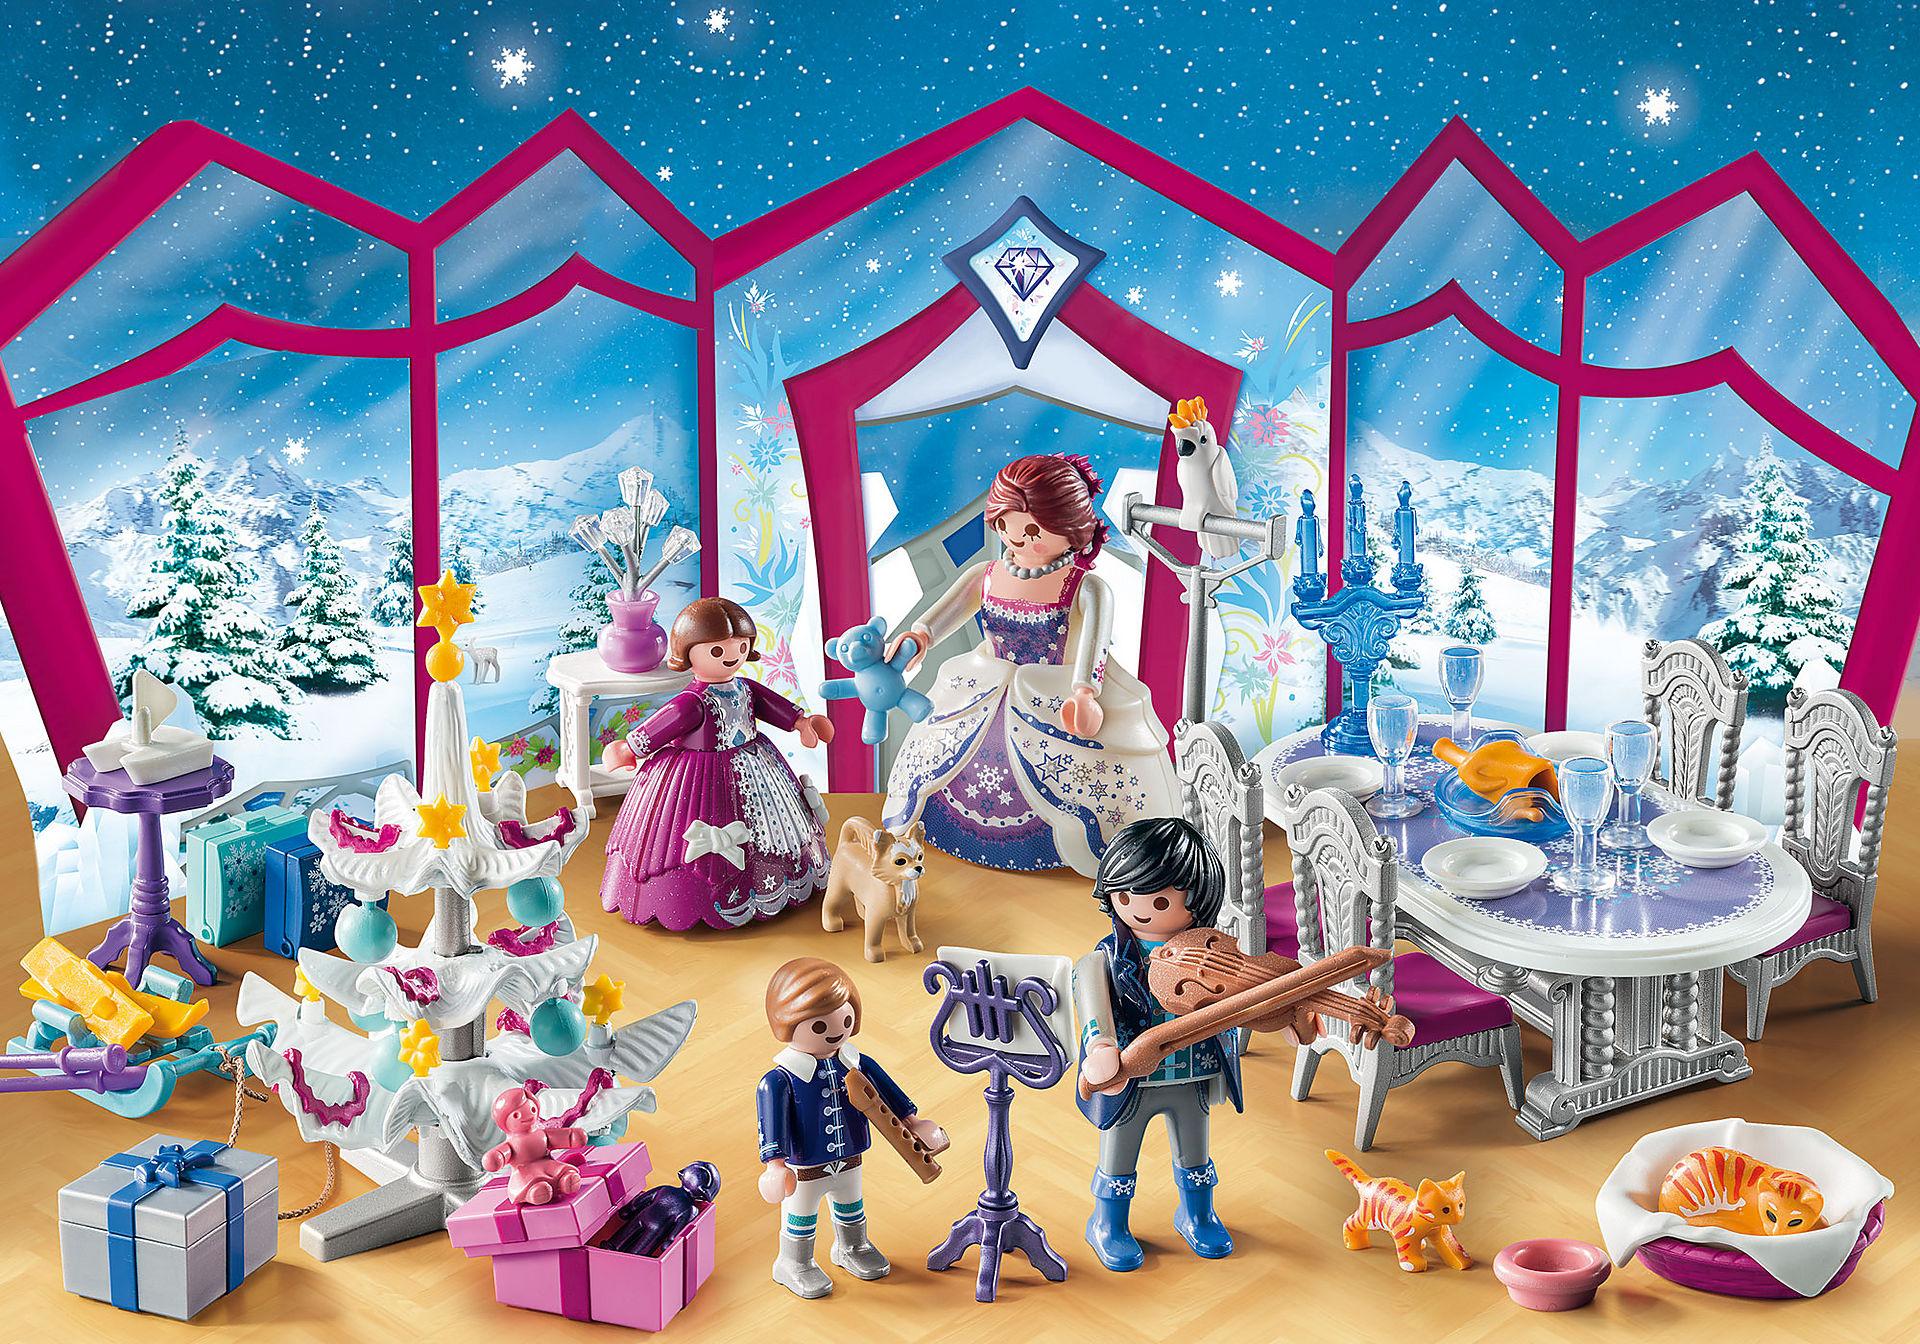 9485 Advent Calendar - Christmas Ball zoom image3